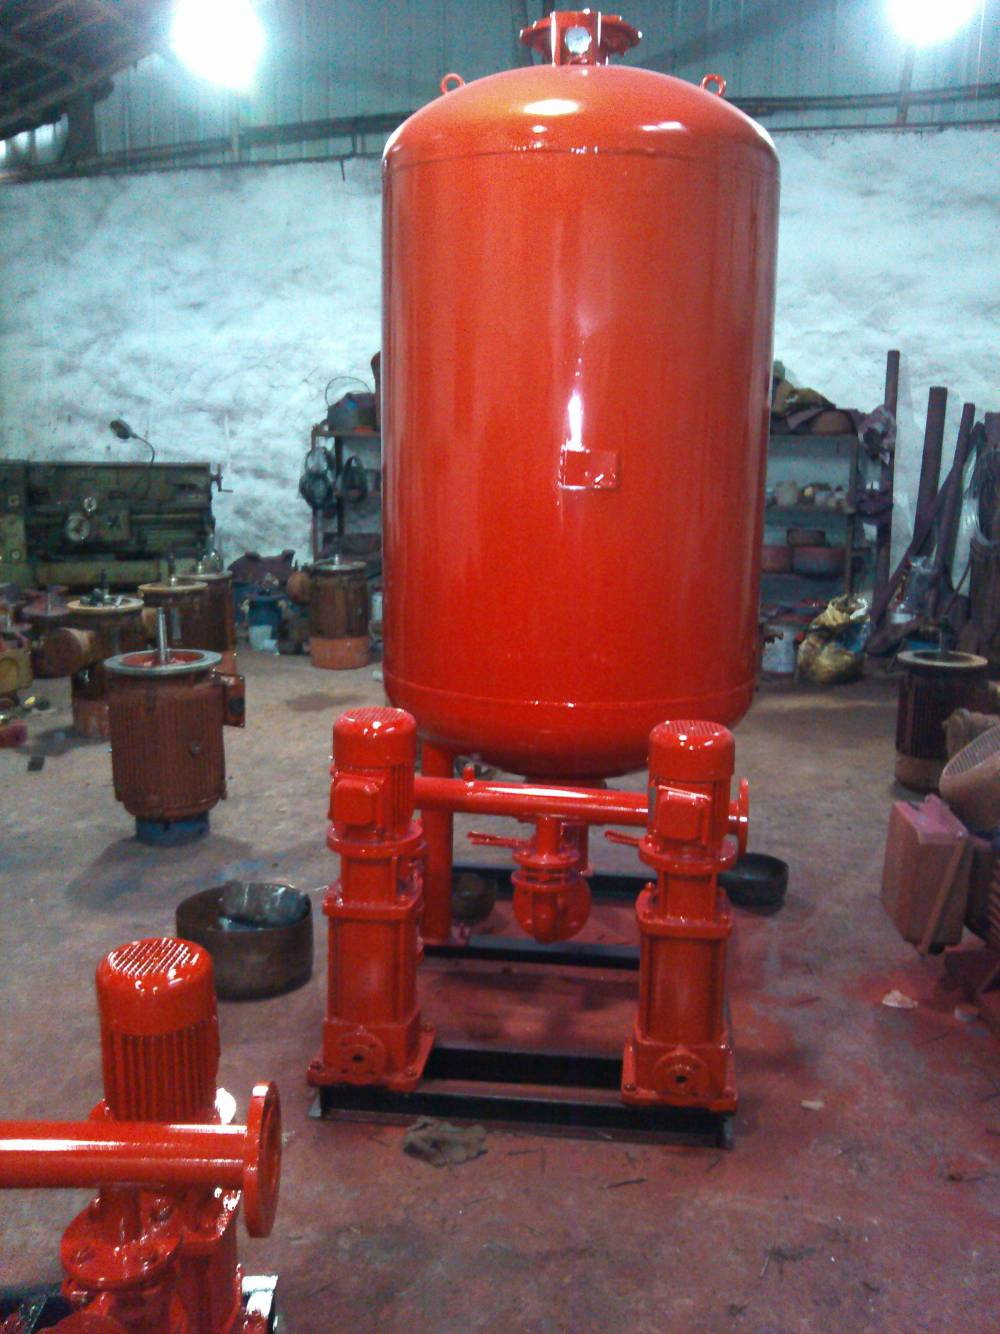 ZW-ML消防增壓設備消防增壓穩壓設備消火栓穩壓泵噴淋穩壓設備